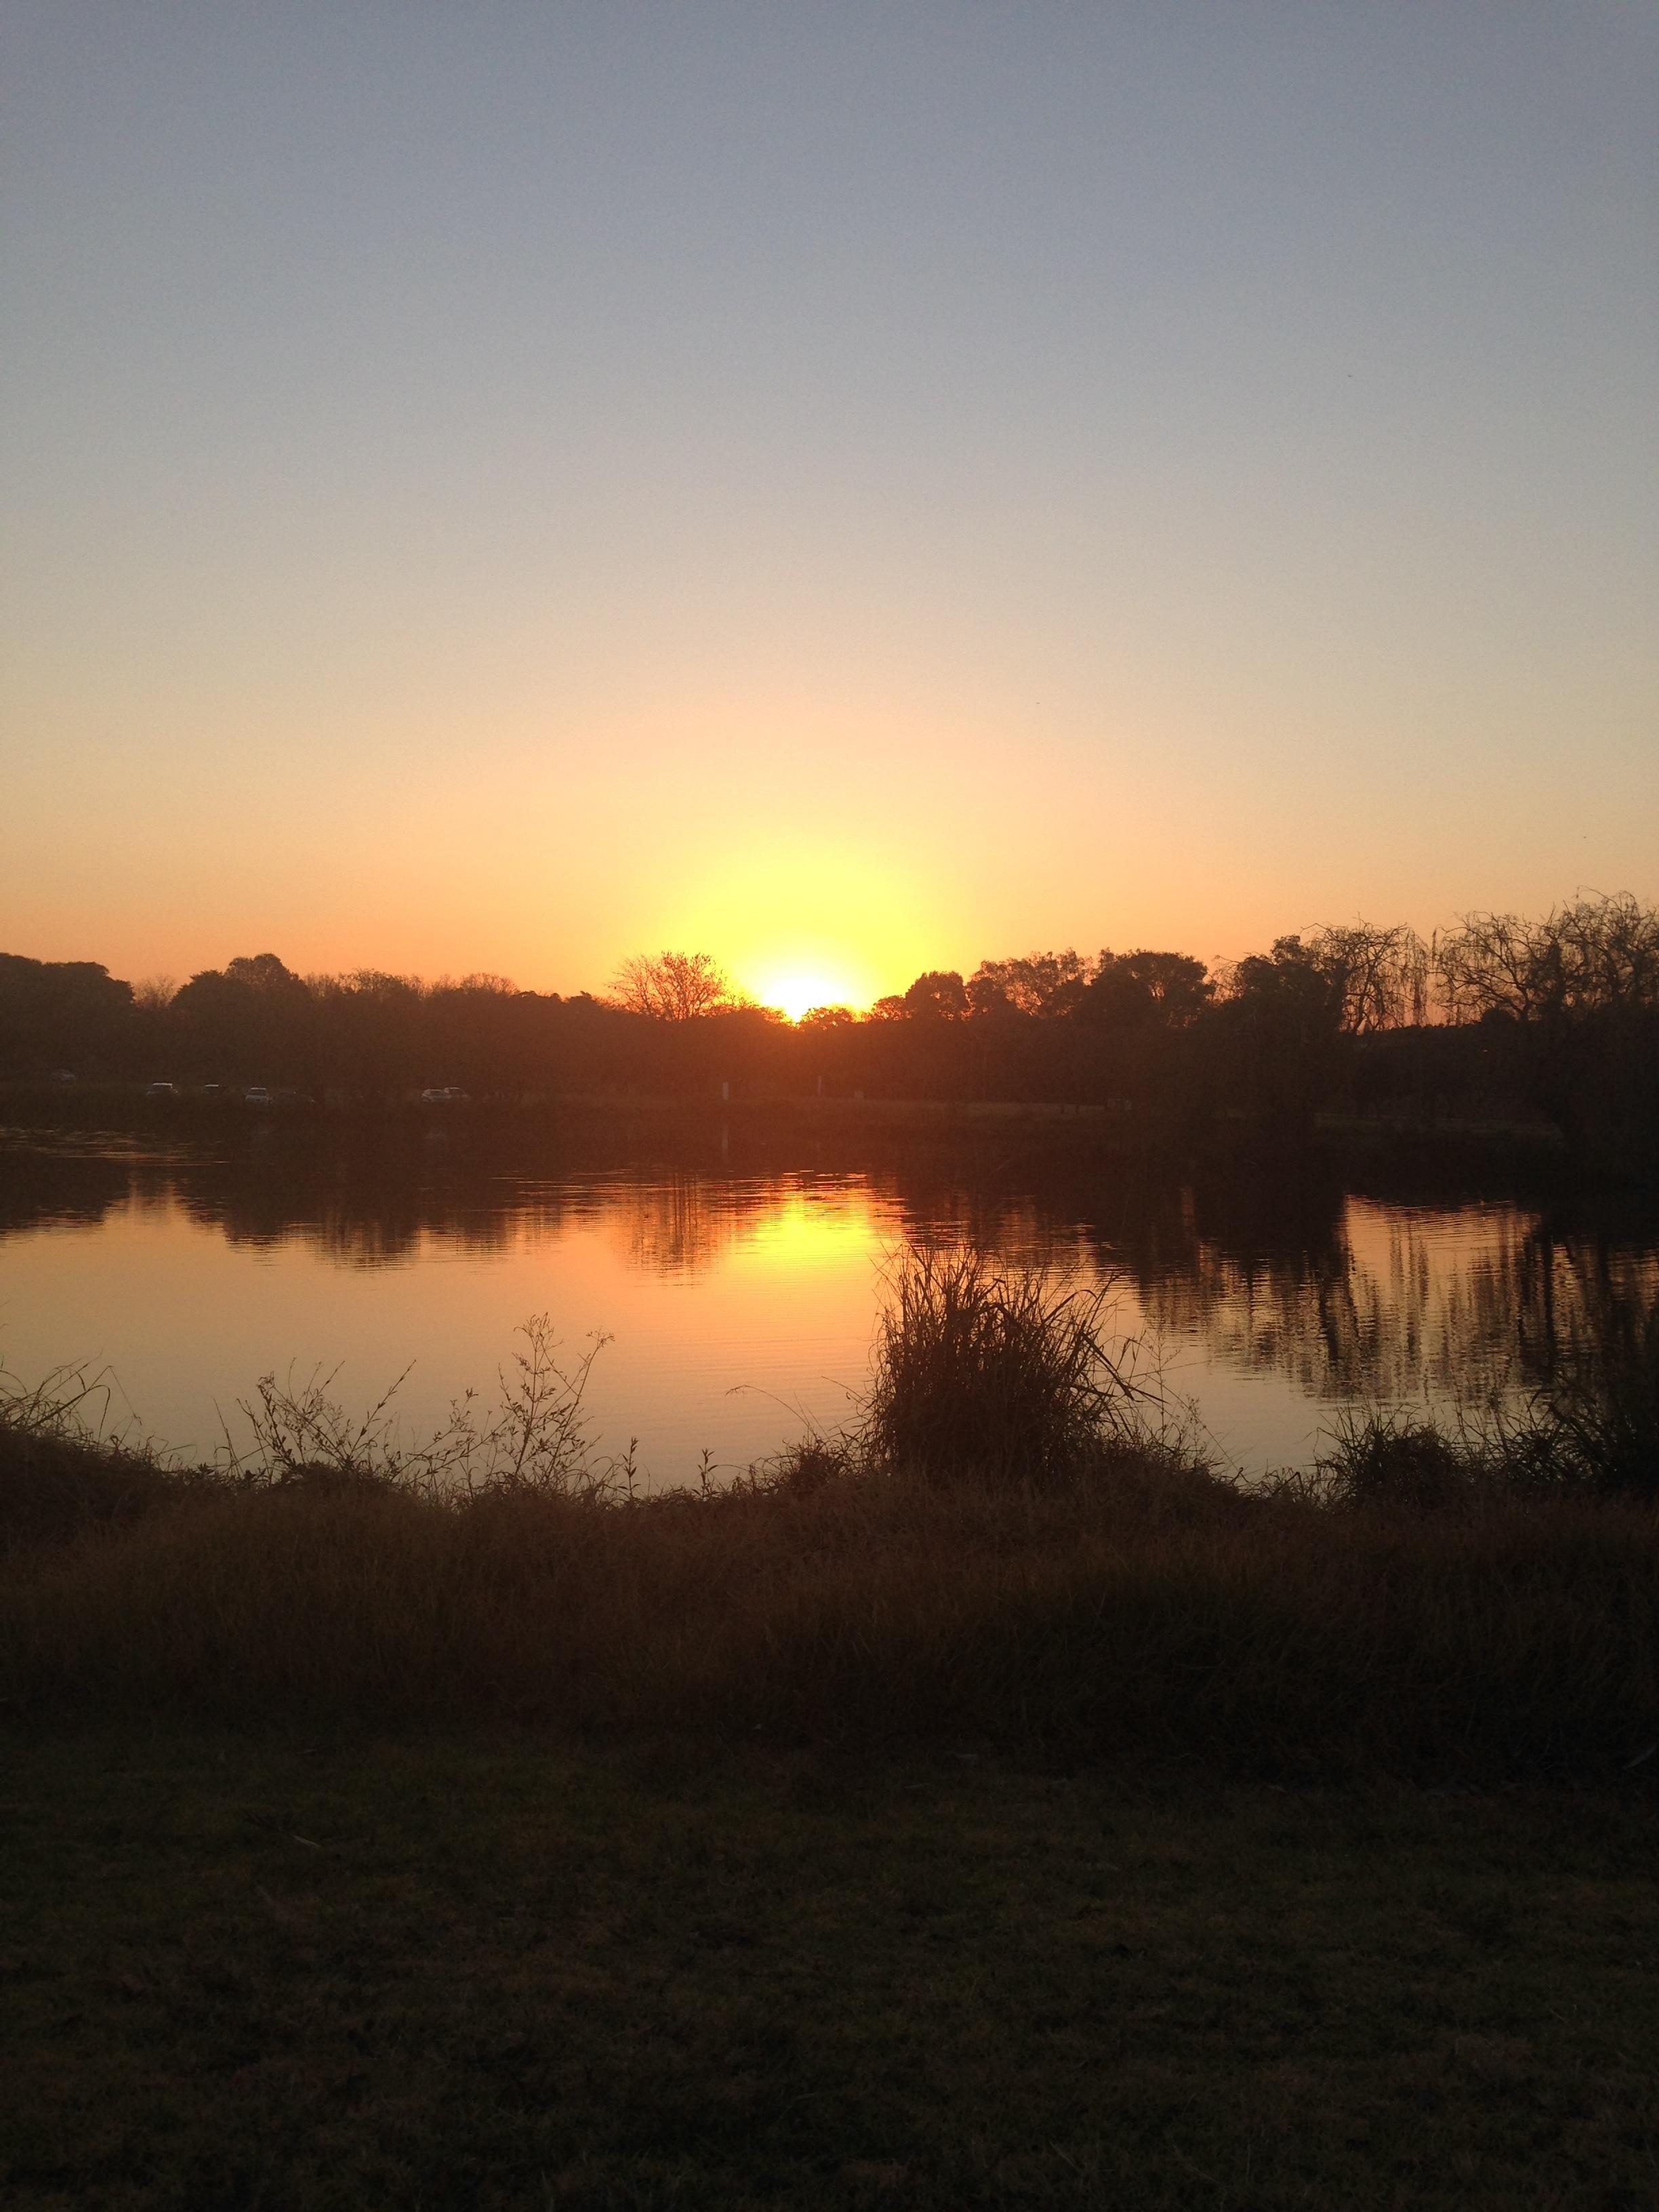 On the Horizon:  Pretoria, South Africa